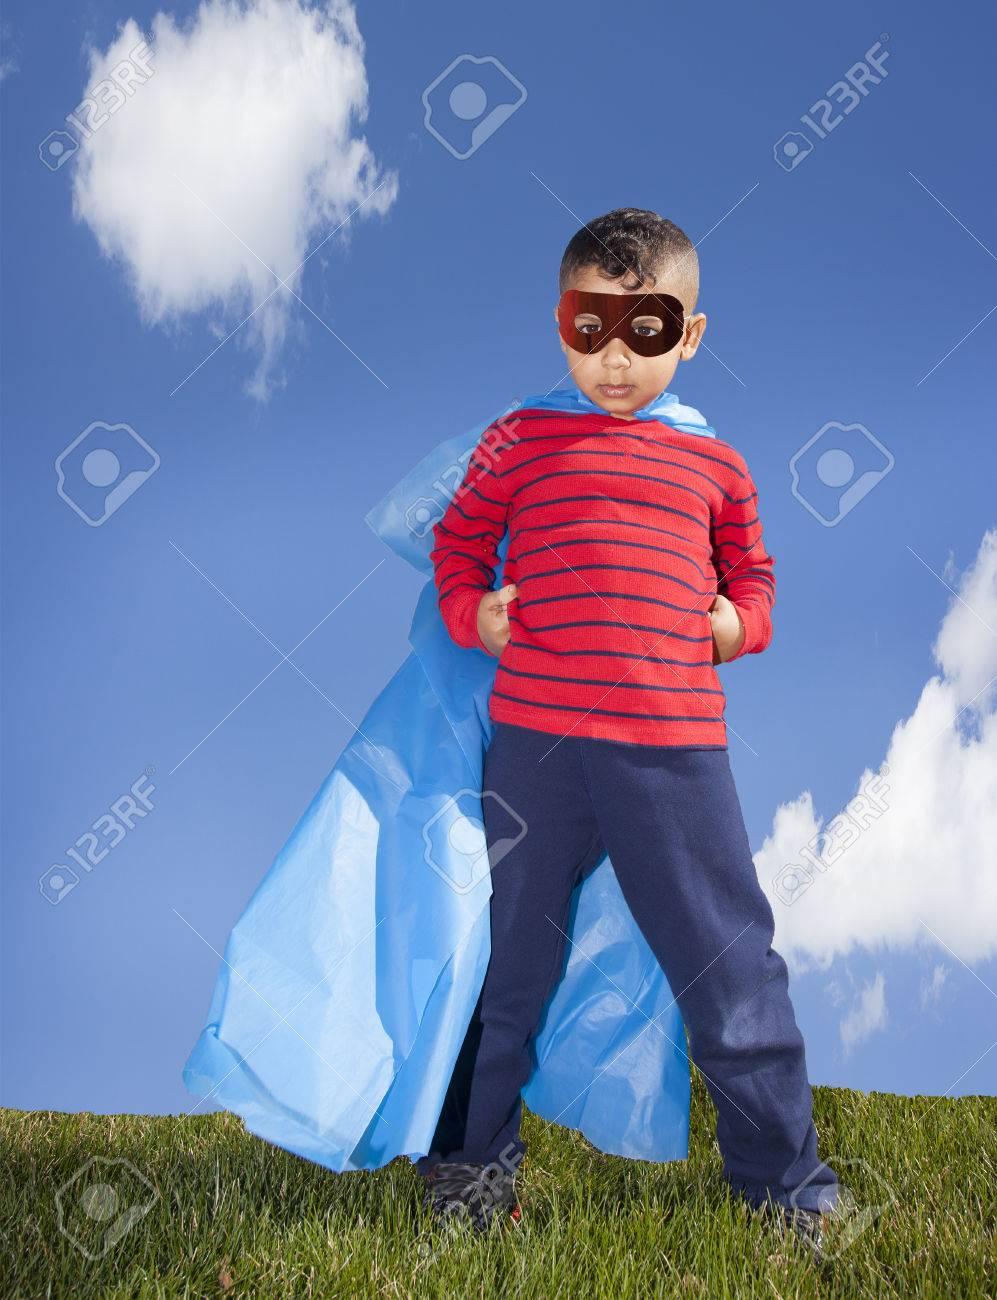 little boy superhero against blue sky - 39761881